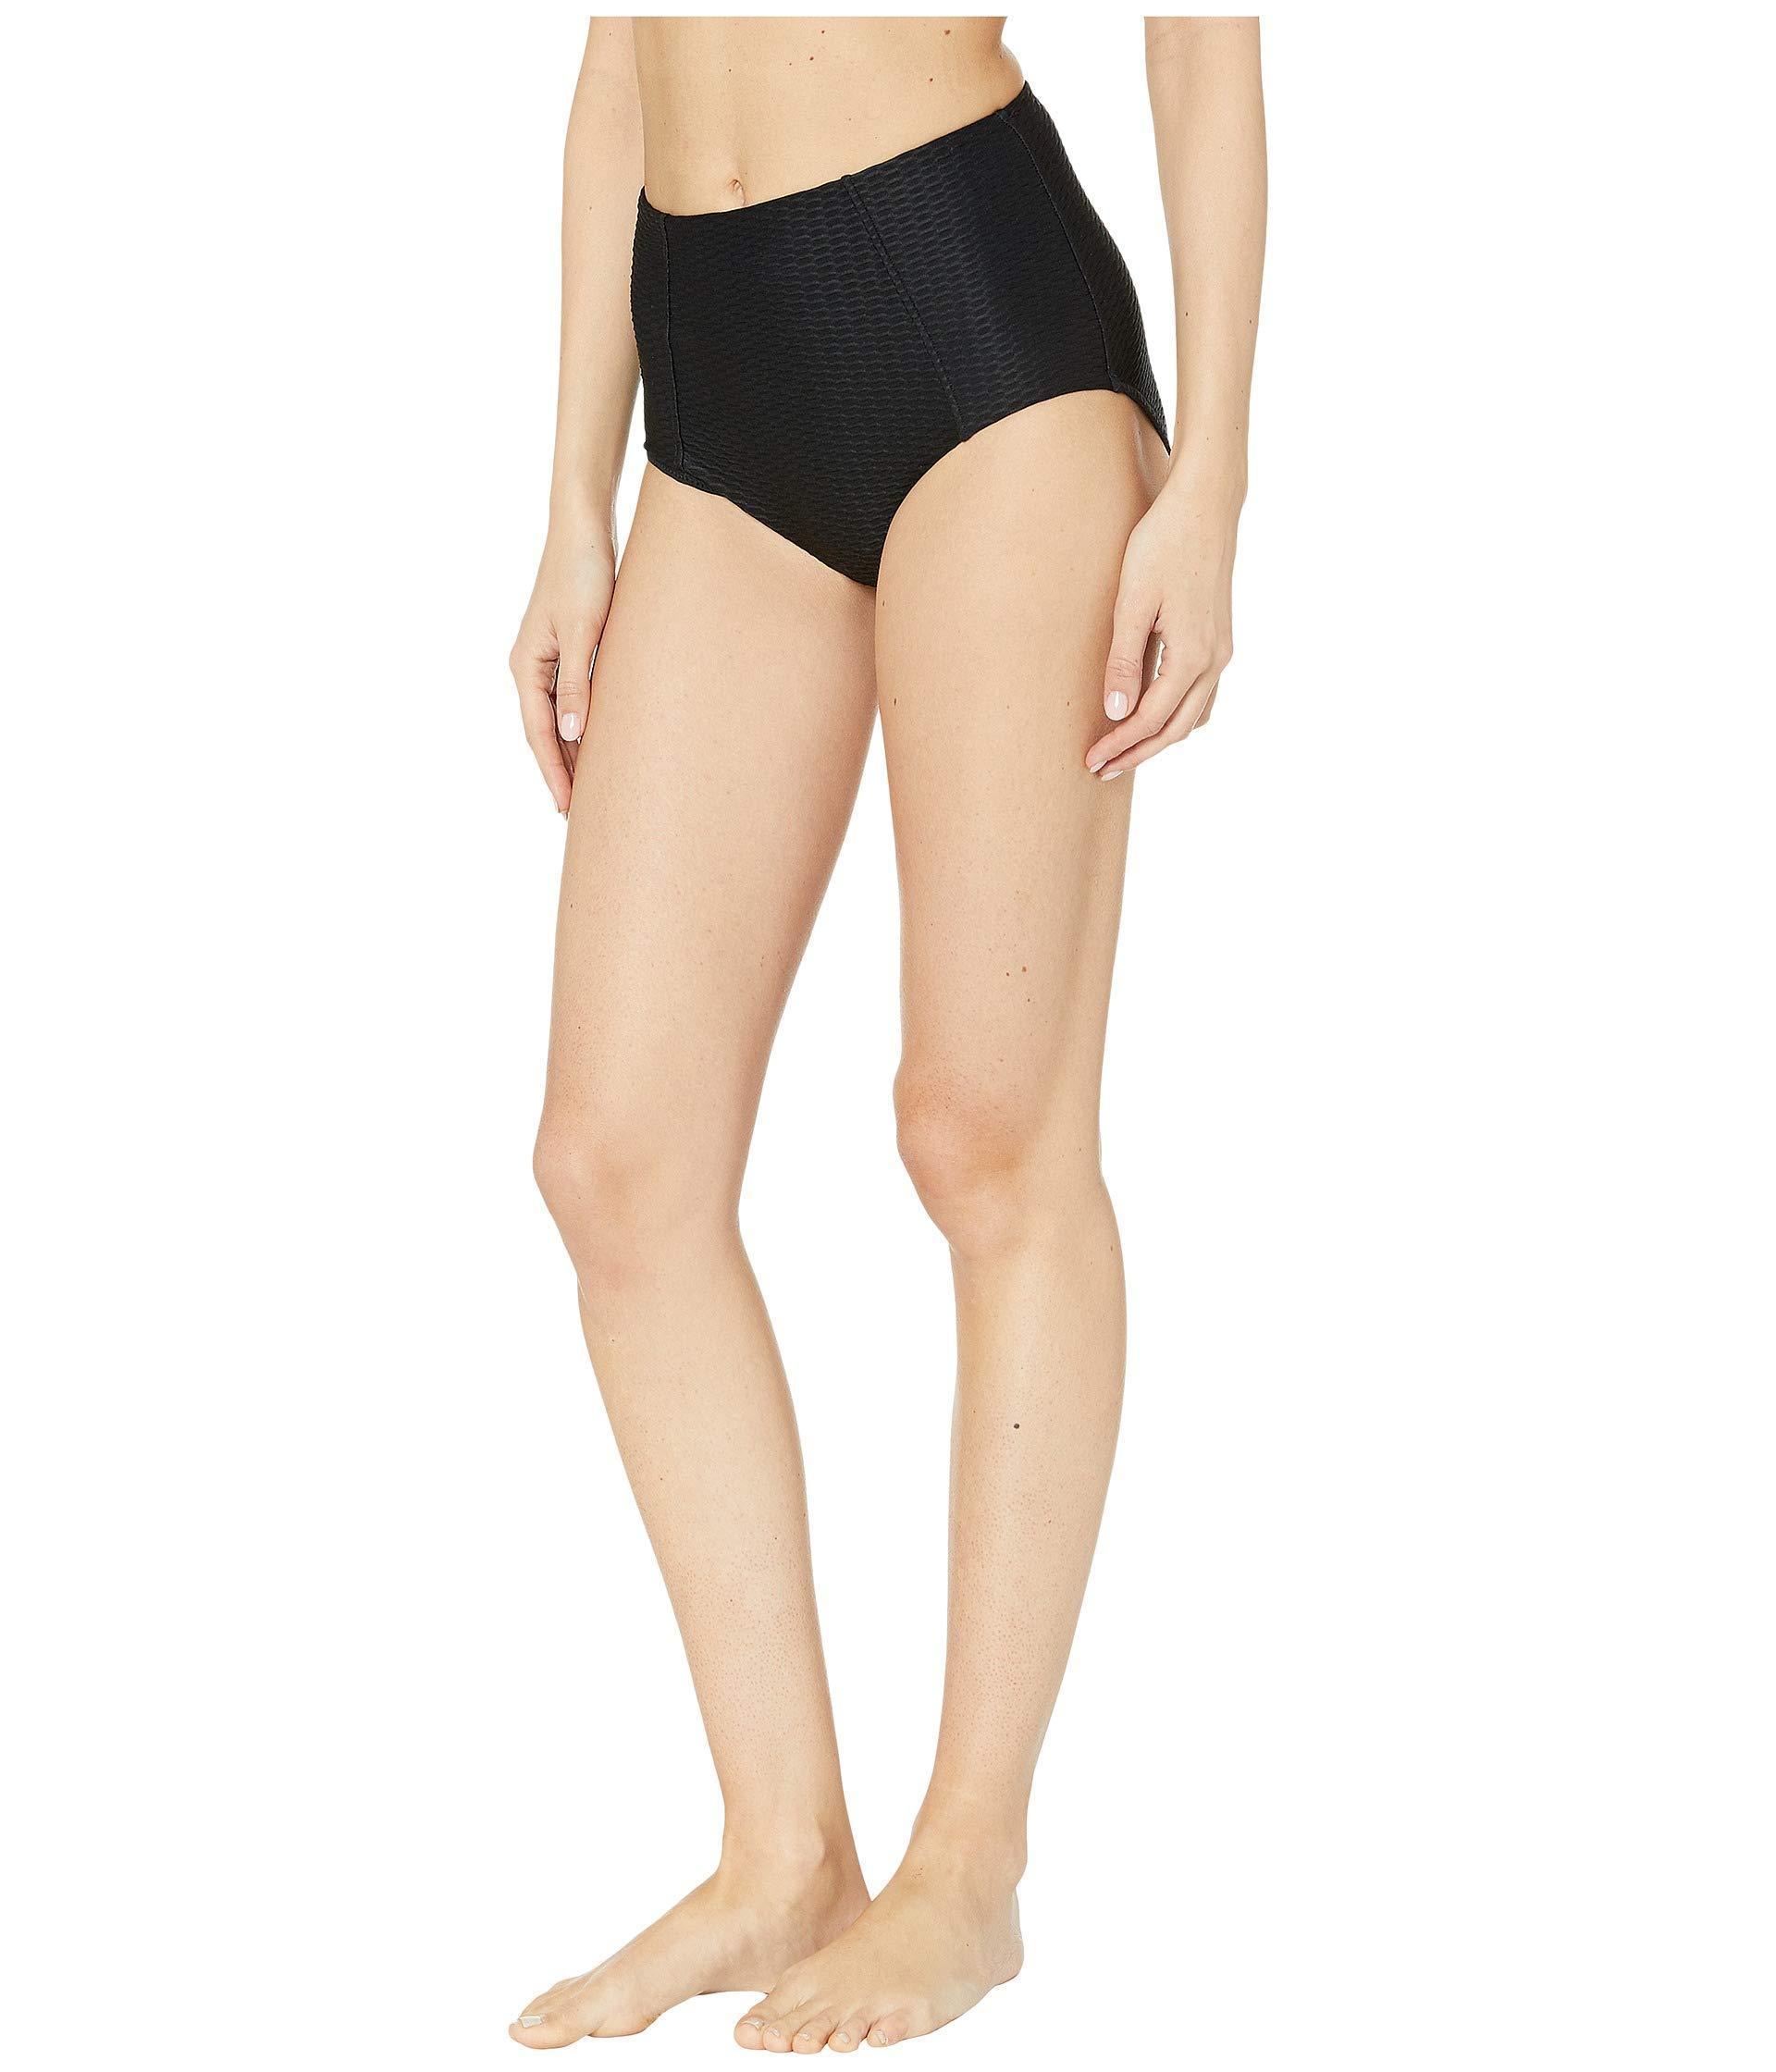 ebe5e5570cc76 Seafolly La Luna High Waisted Bikini Pants (black) Women's Swimwear in Black  - Lyst